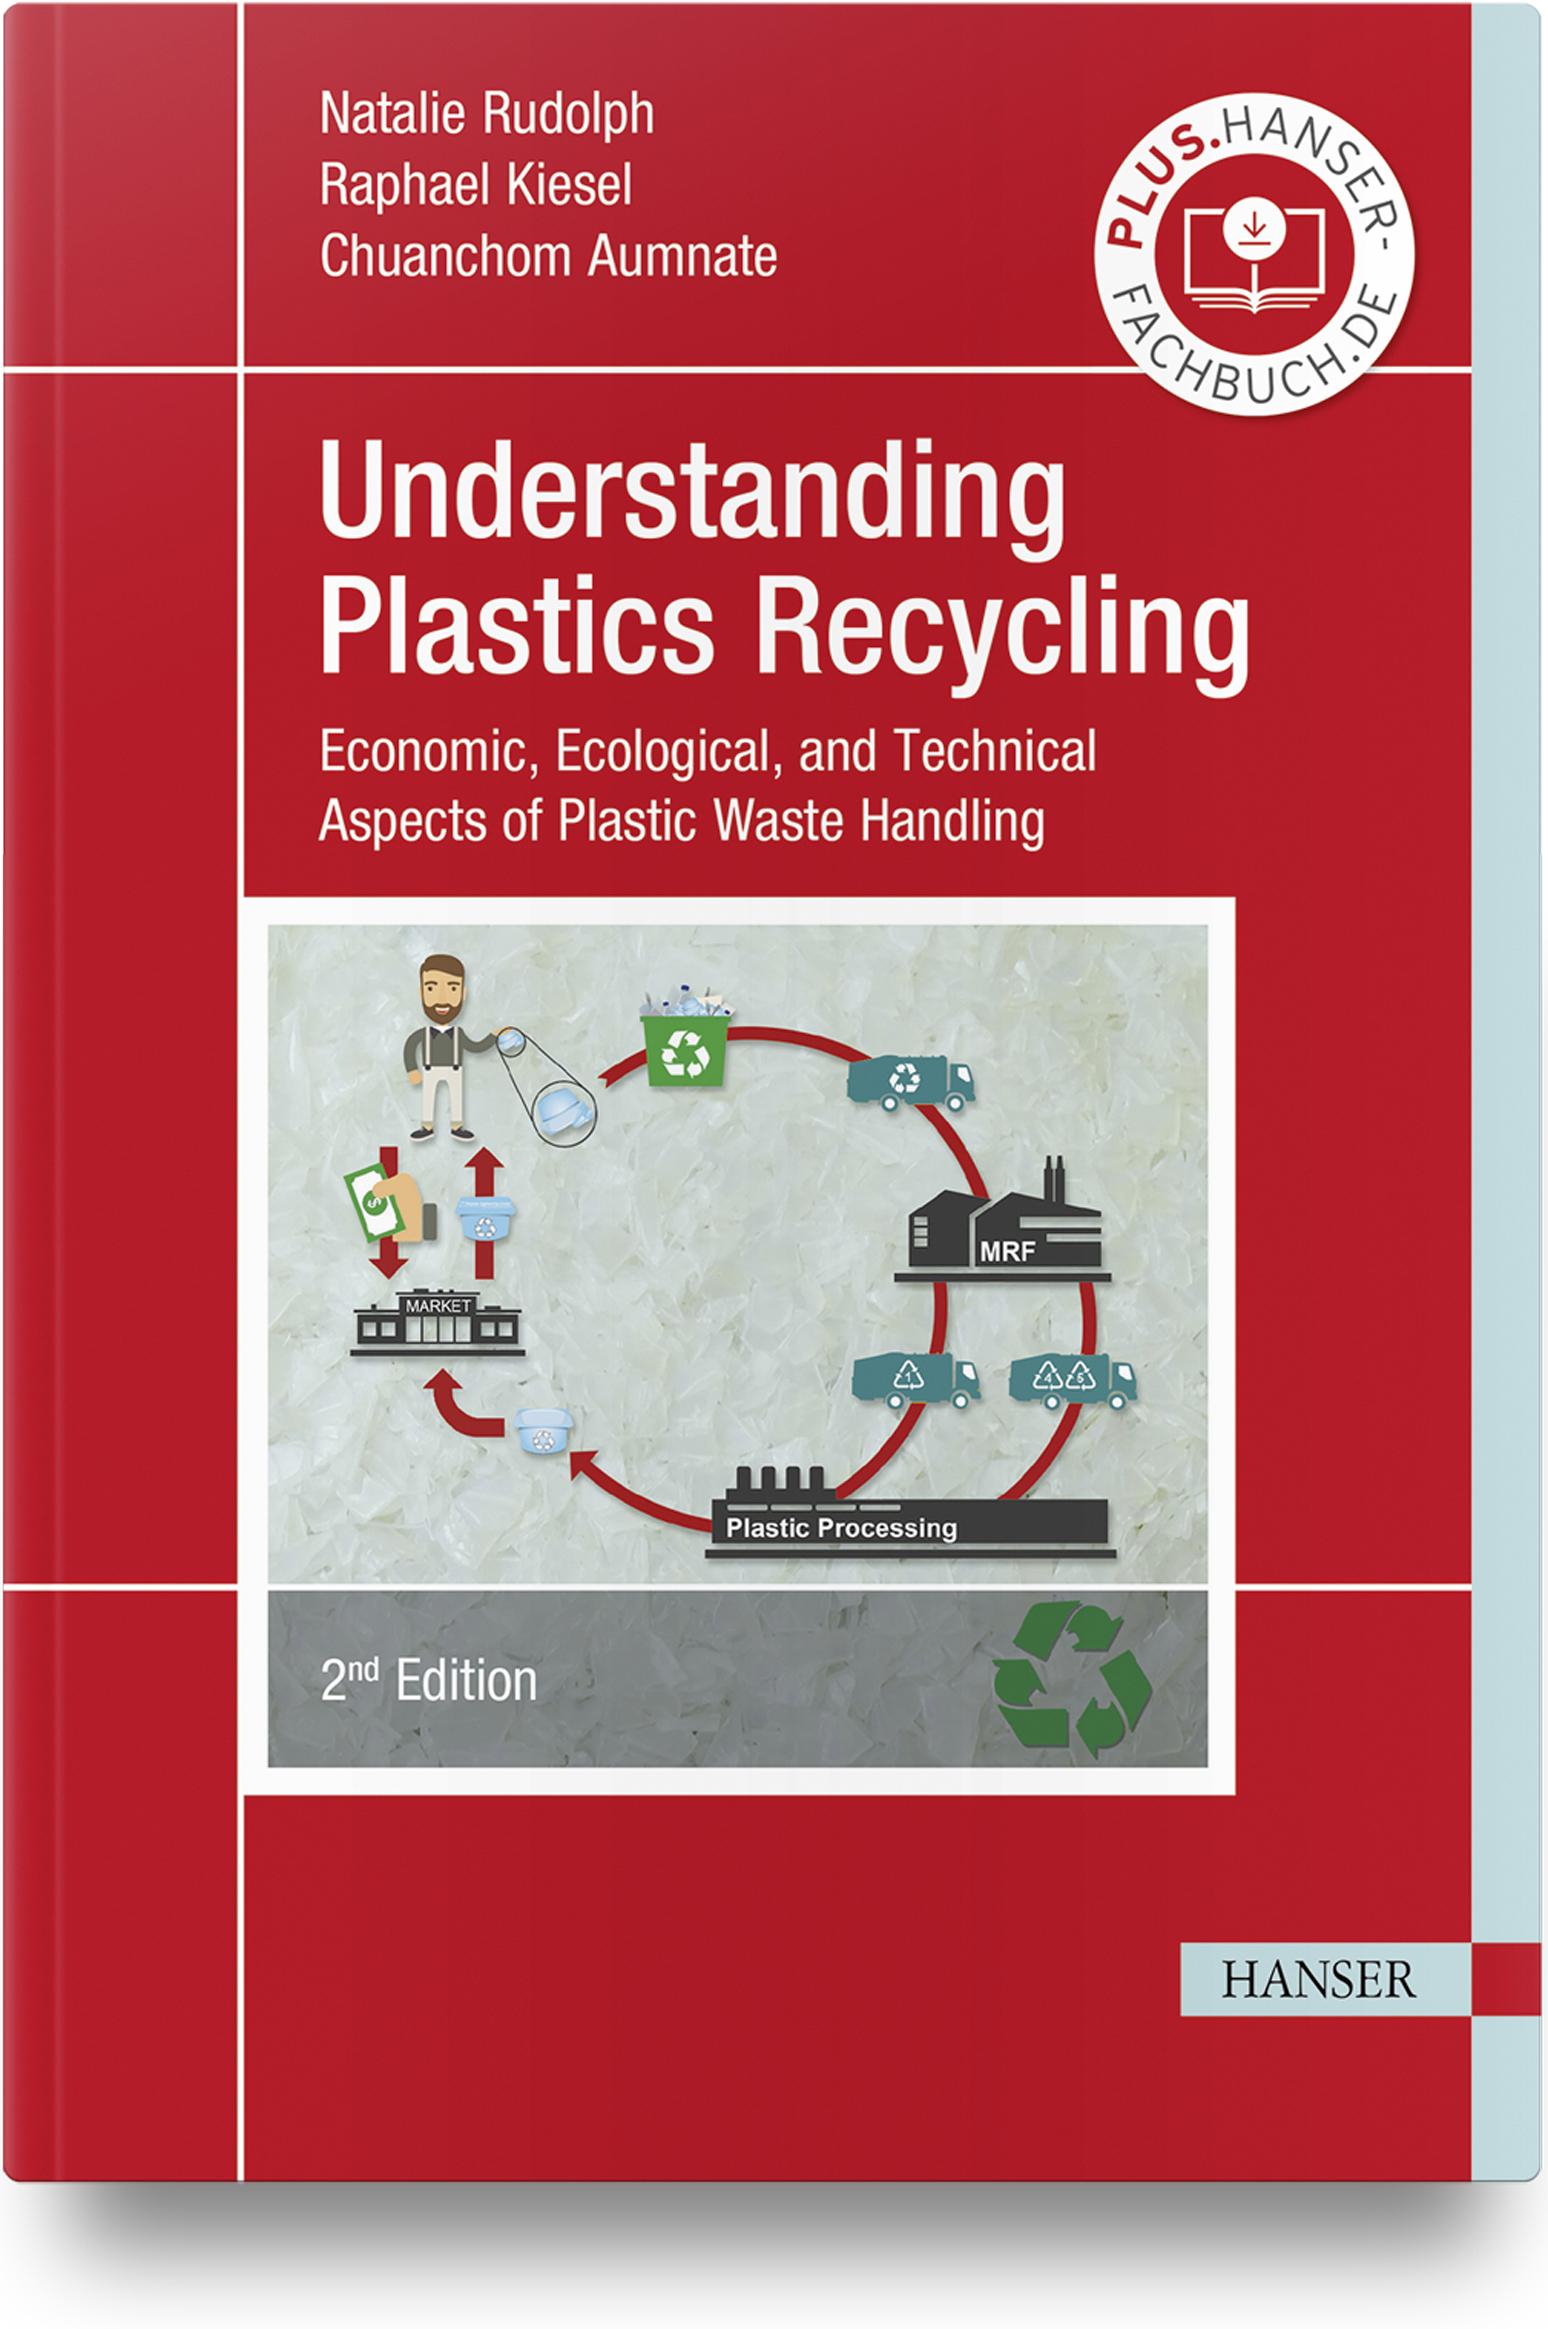 Rudolph, Kiesel, Aumnate, Understanding Plastics Recycling, 978-1-56990-846-4